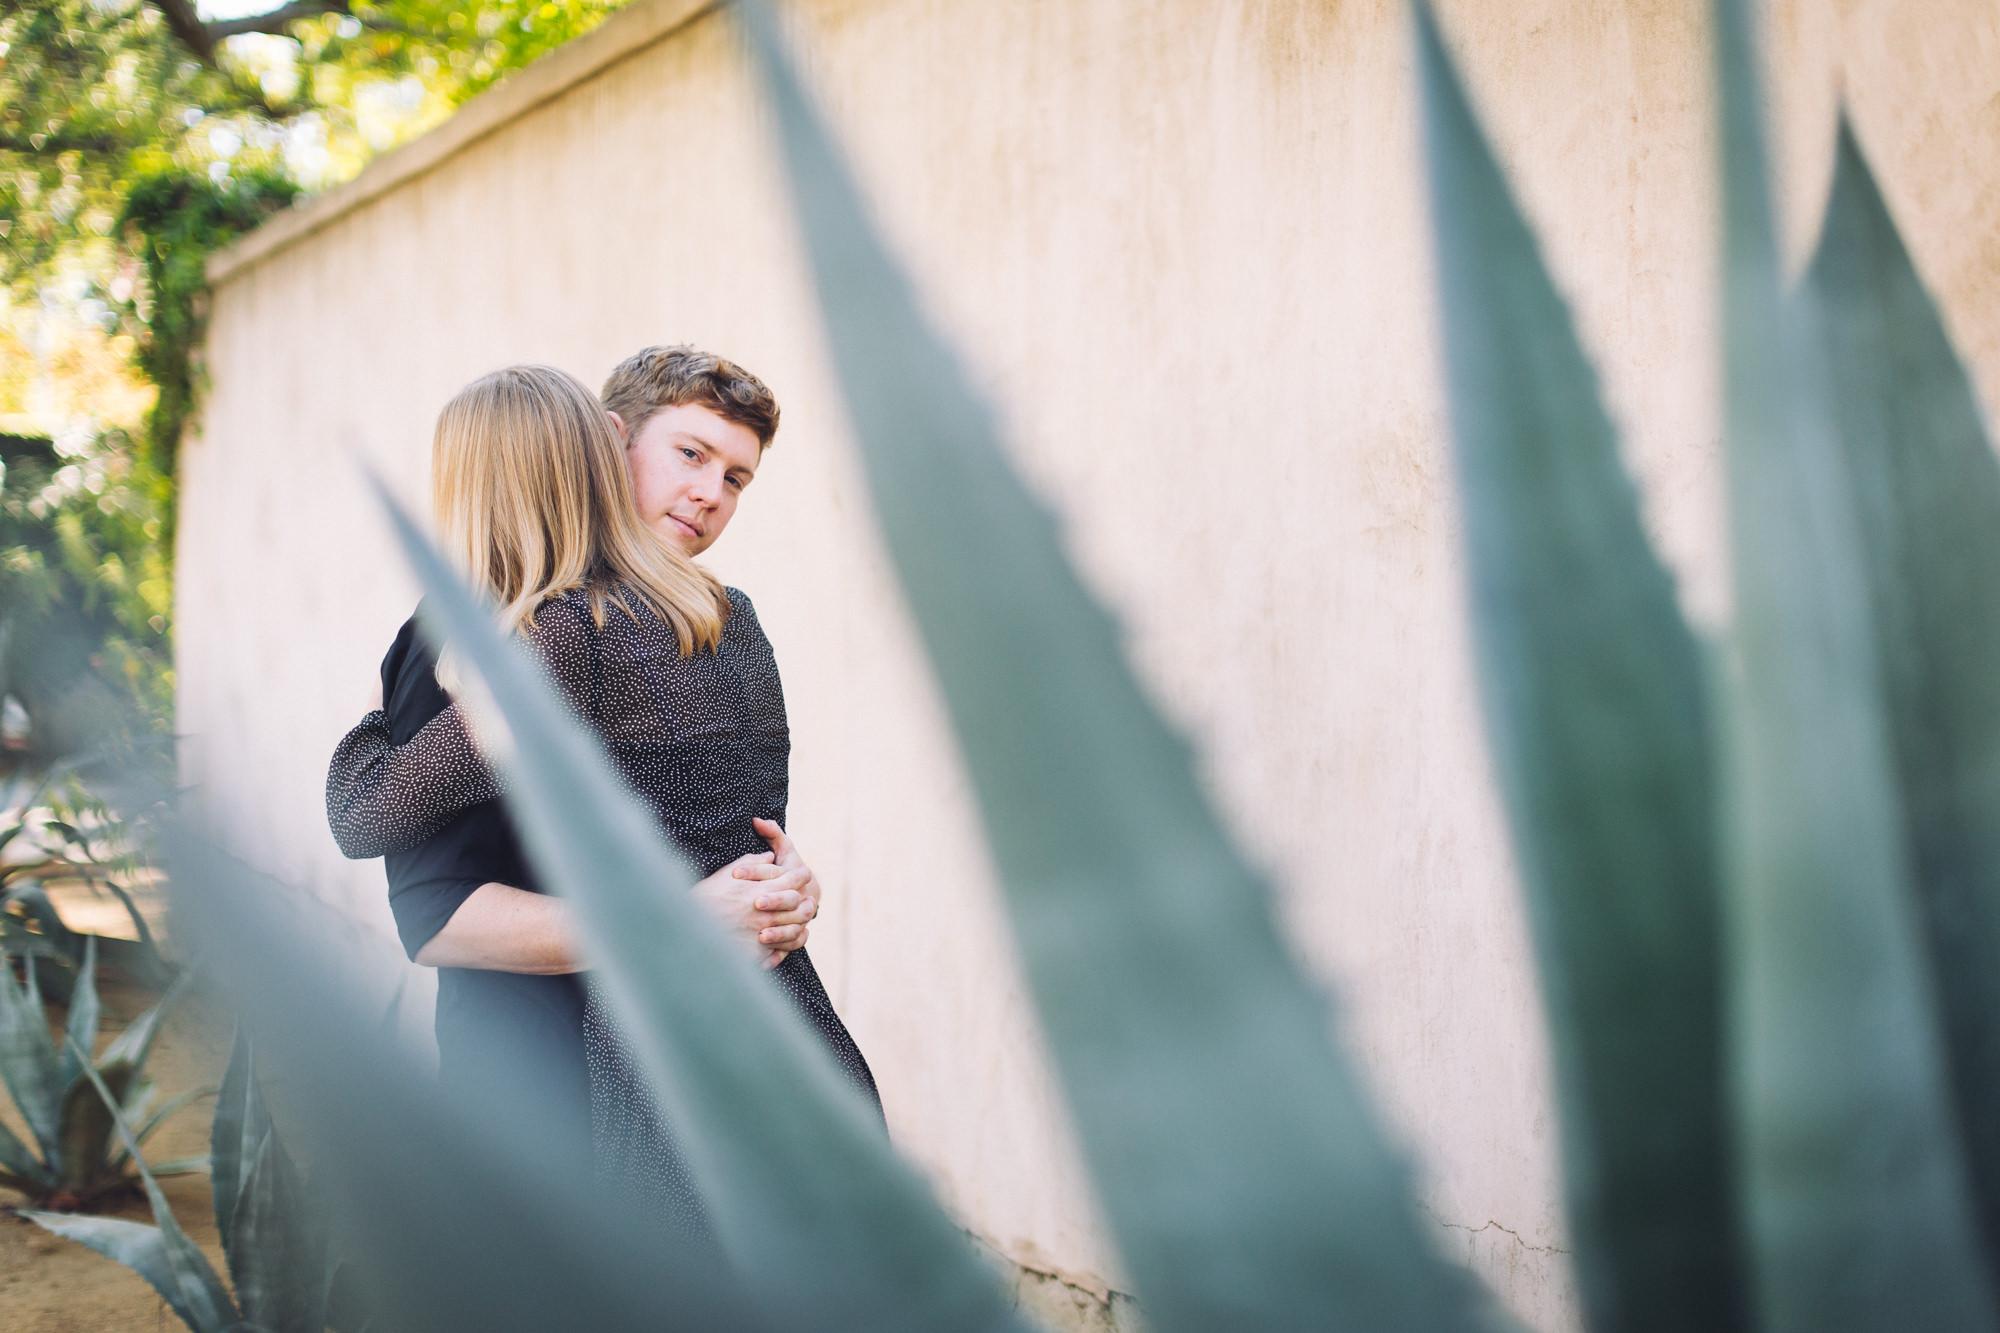 thelightandglass-wedding-engagement-photography-014.jpg